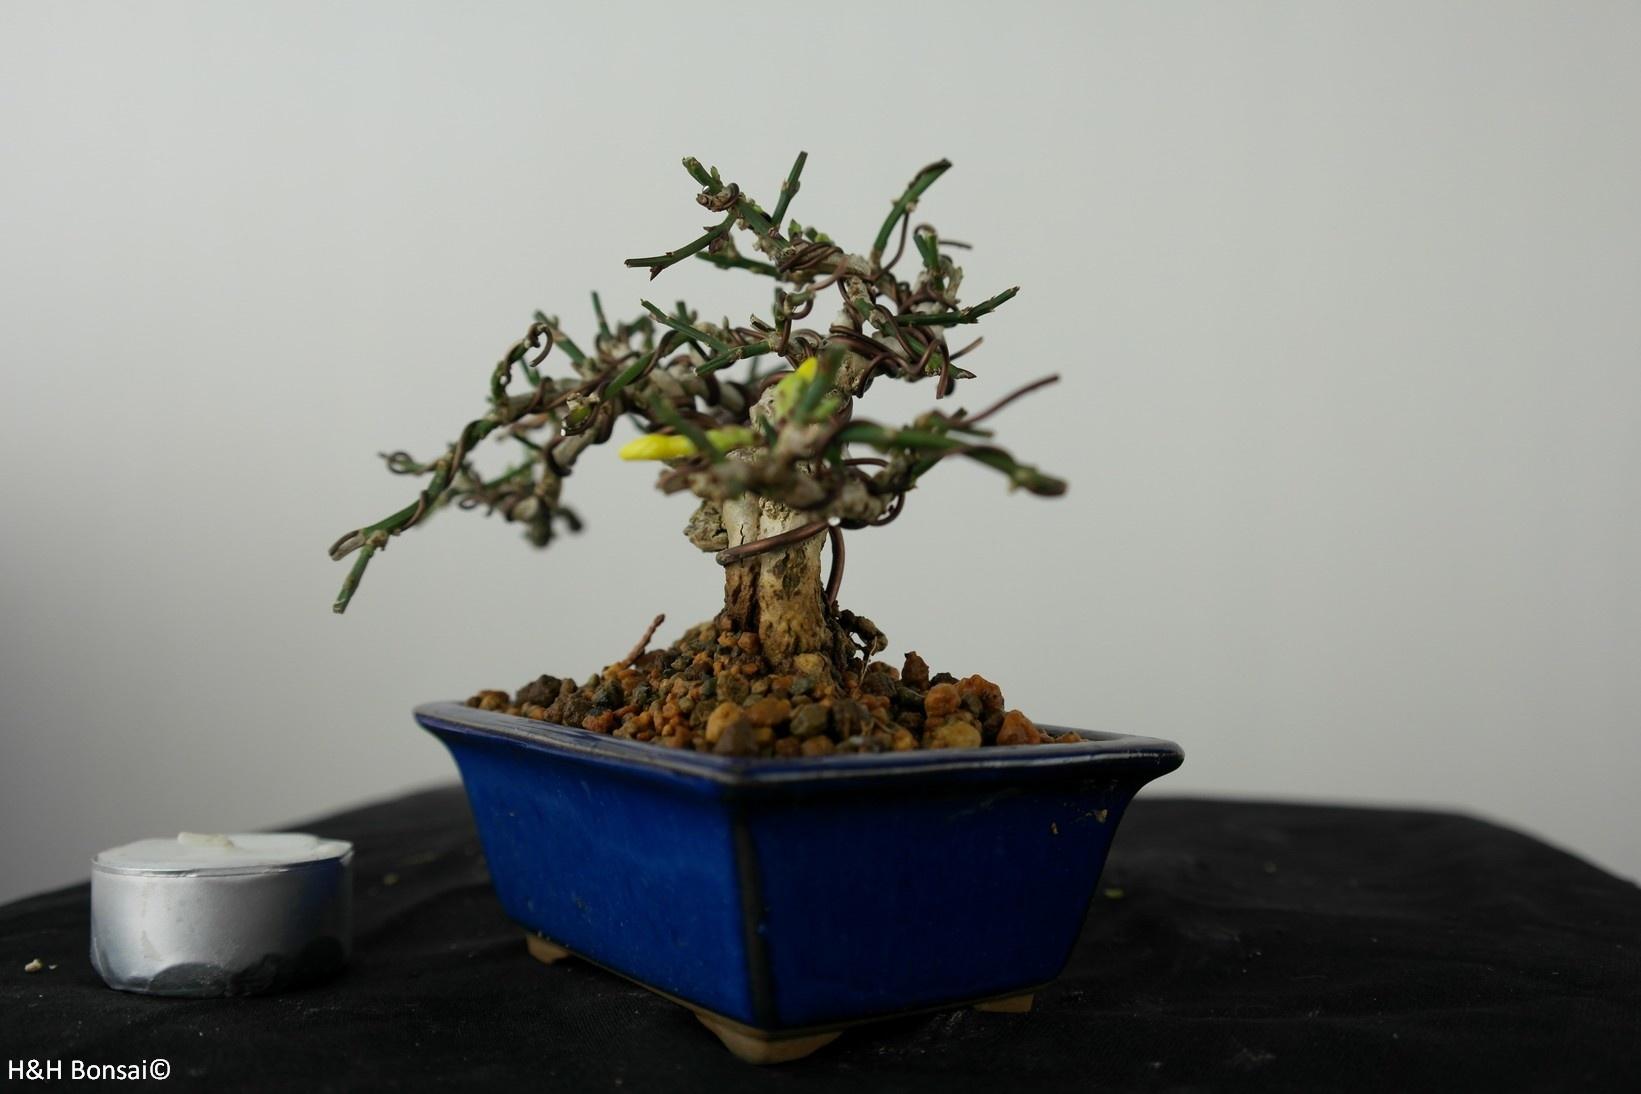 Bonsai ShohinJasmin d'hiver jaune, Jasminum nudiflorum, no. 7527